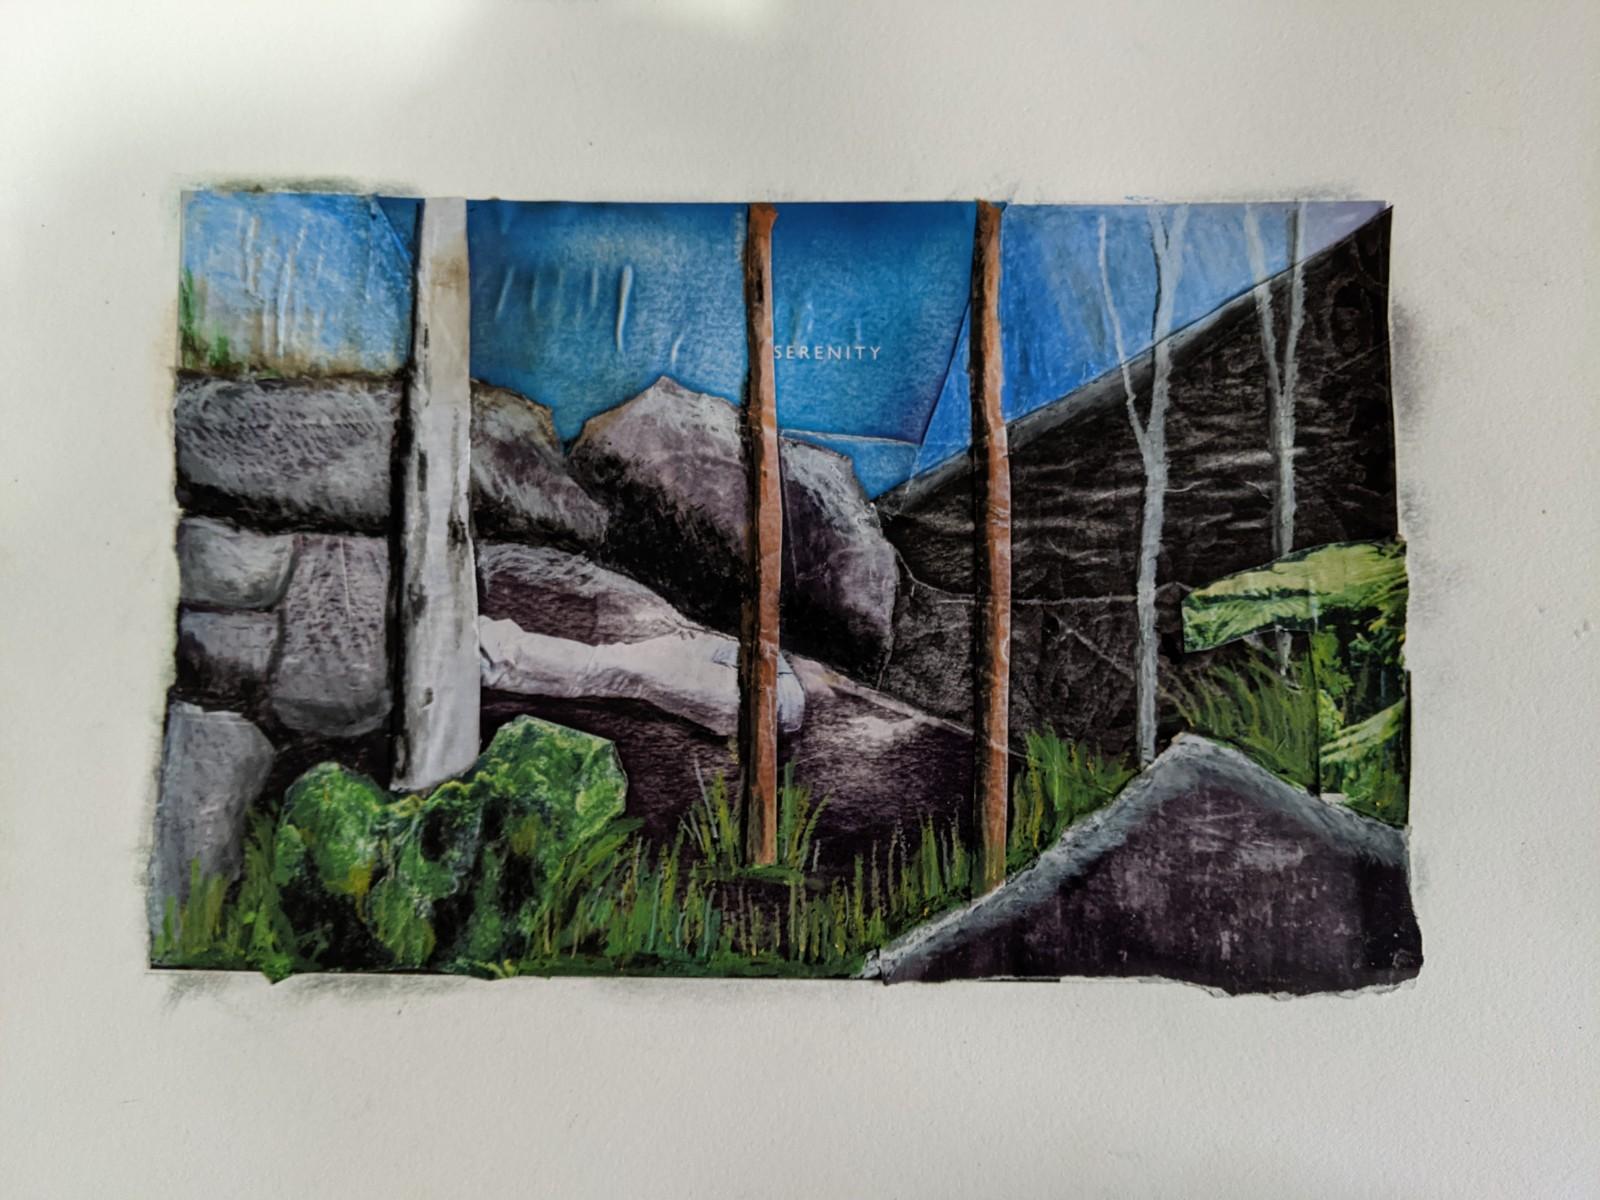 Collage of rocks and trees, Carnarvon Gorge National Park, Queensland